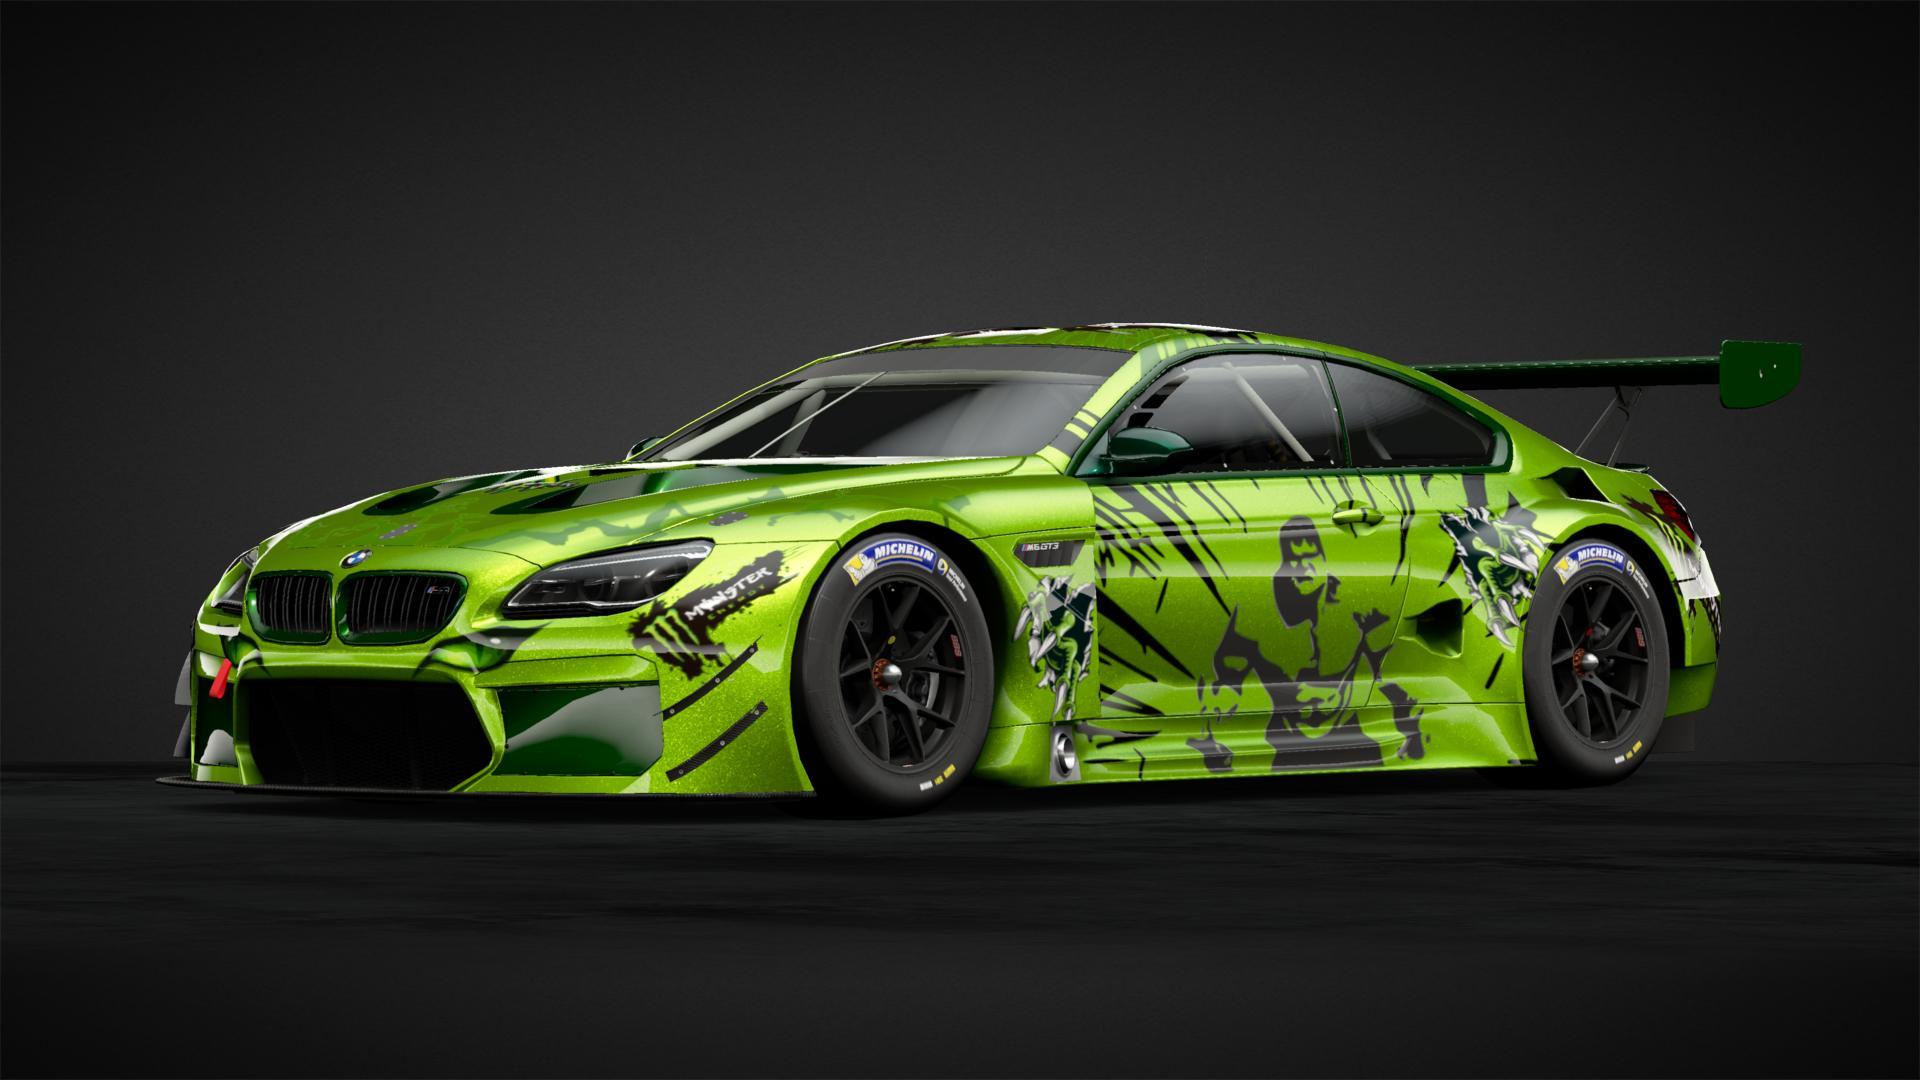 Hulk Monster Energy Apariencias De Autos De Redtorch89